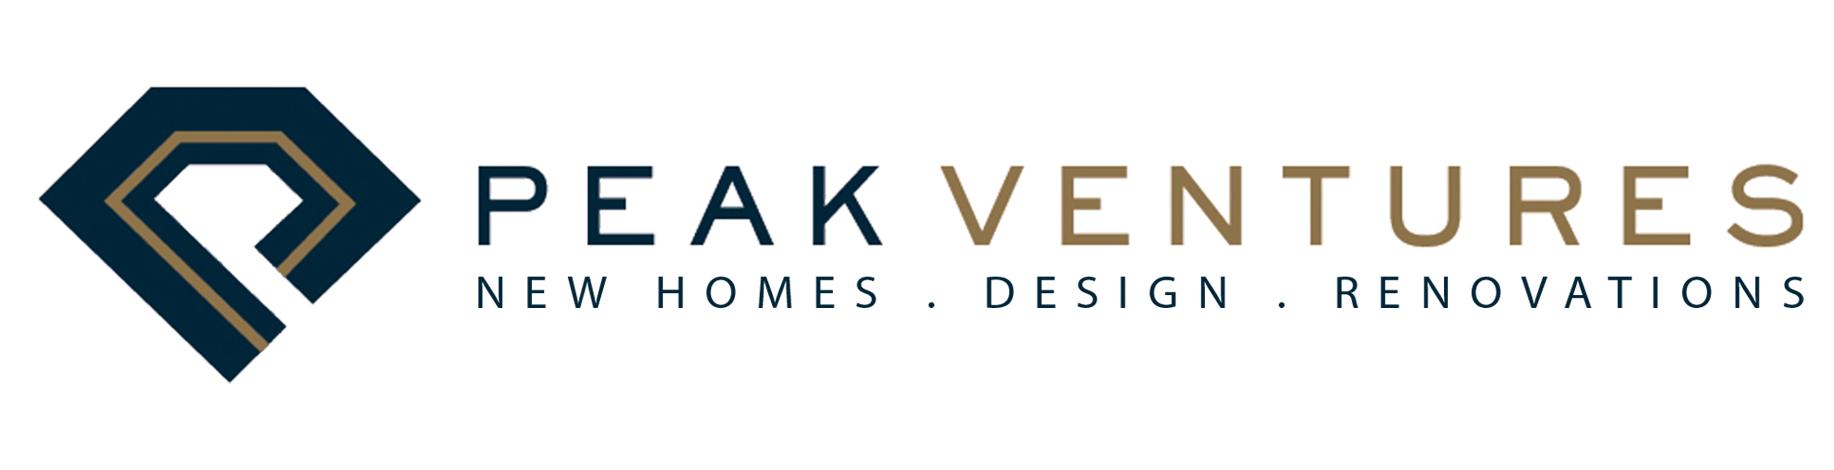 PeakVentures_logo-2019-Transparent-backgroung.png